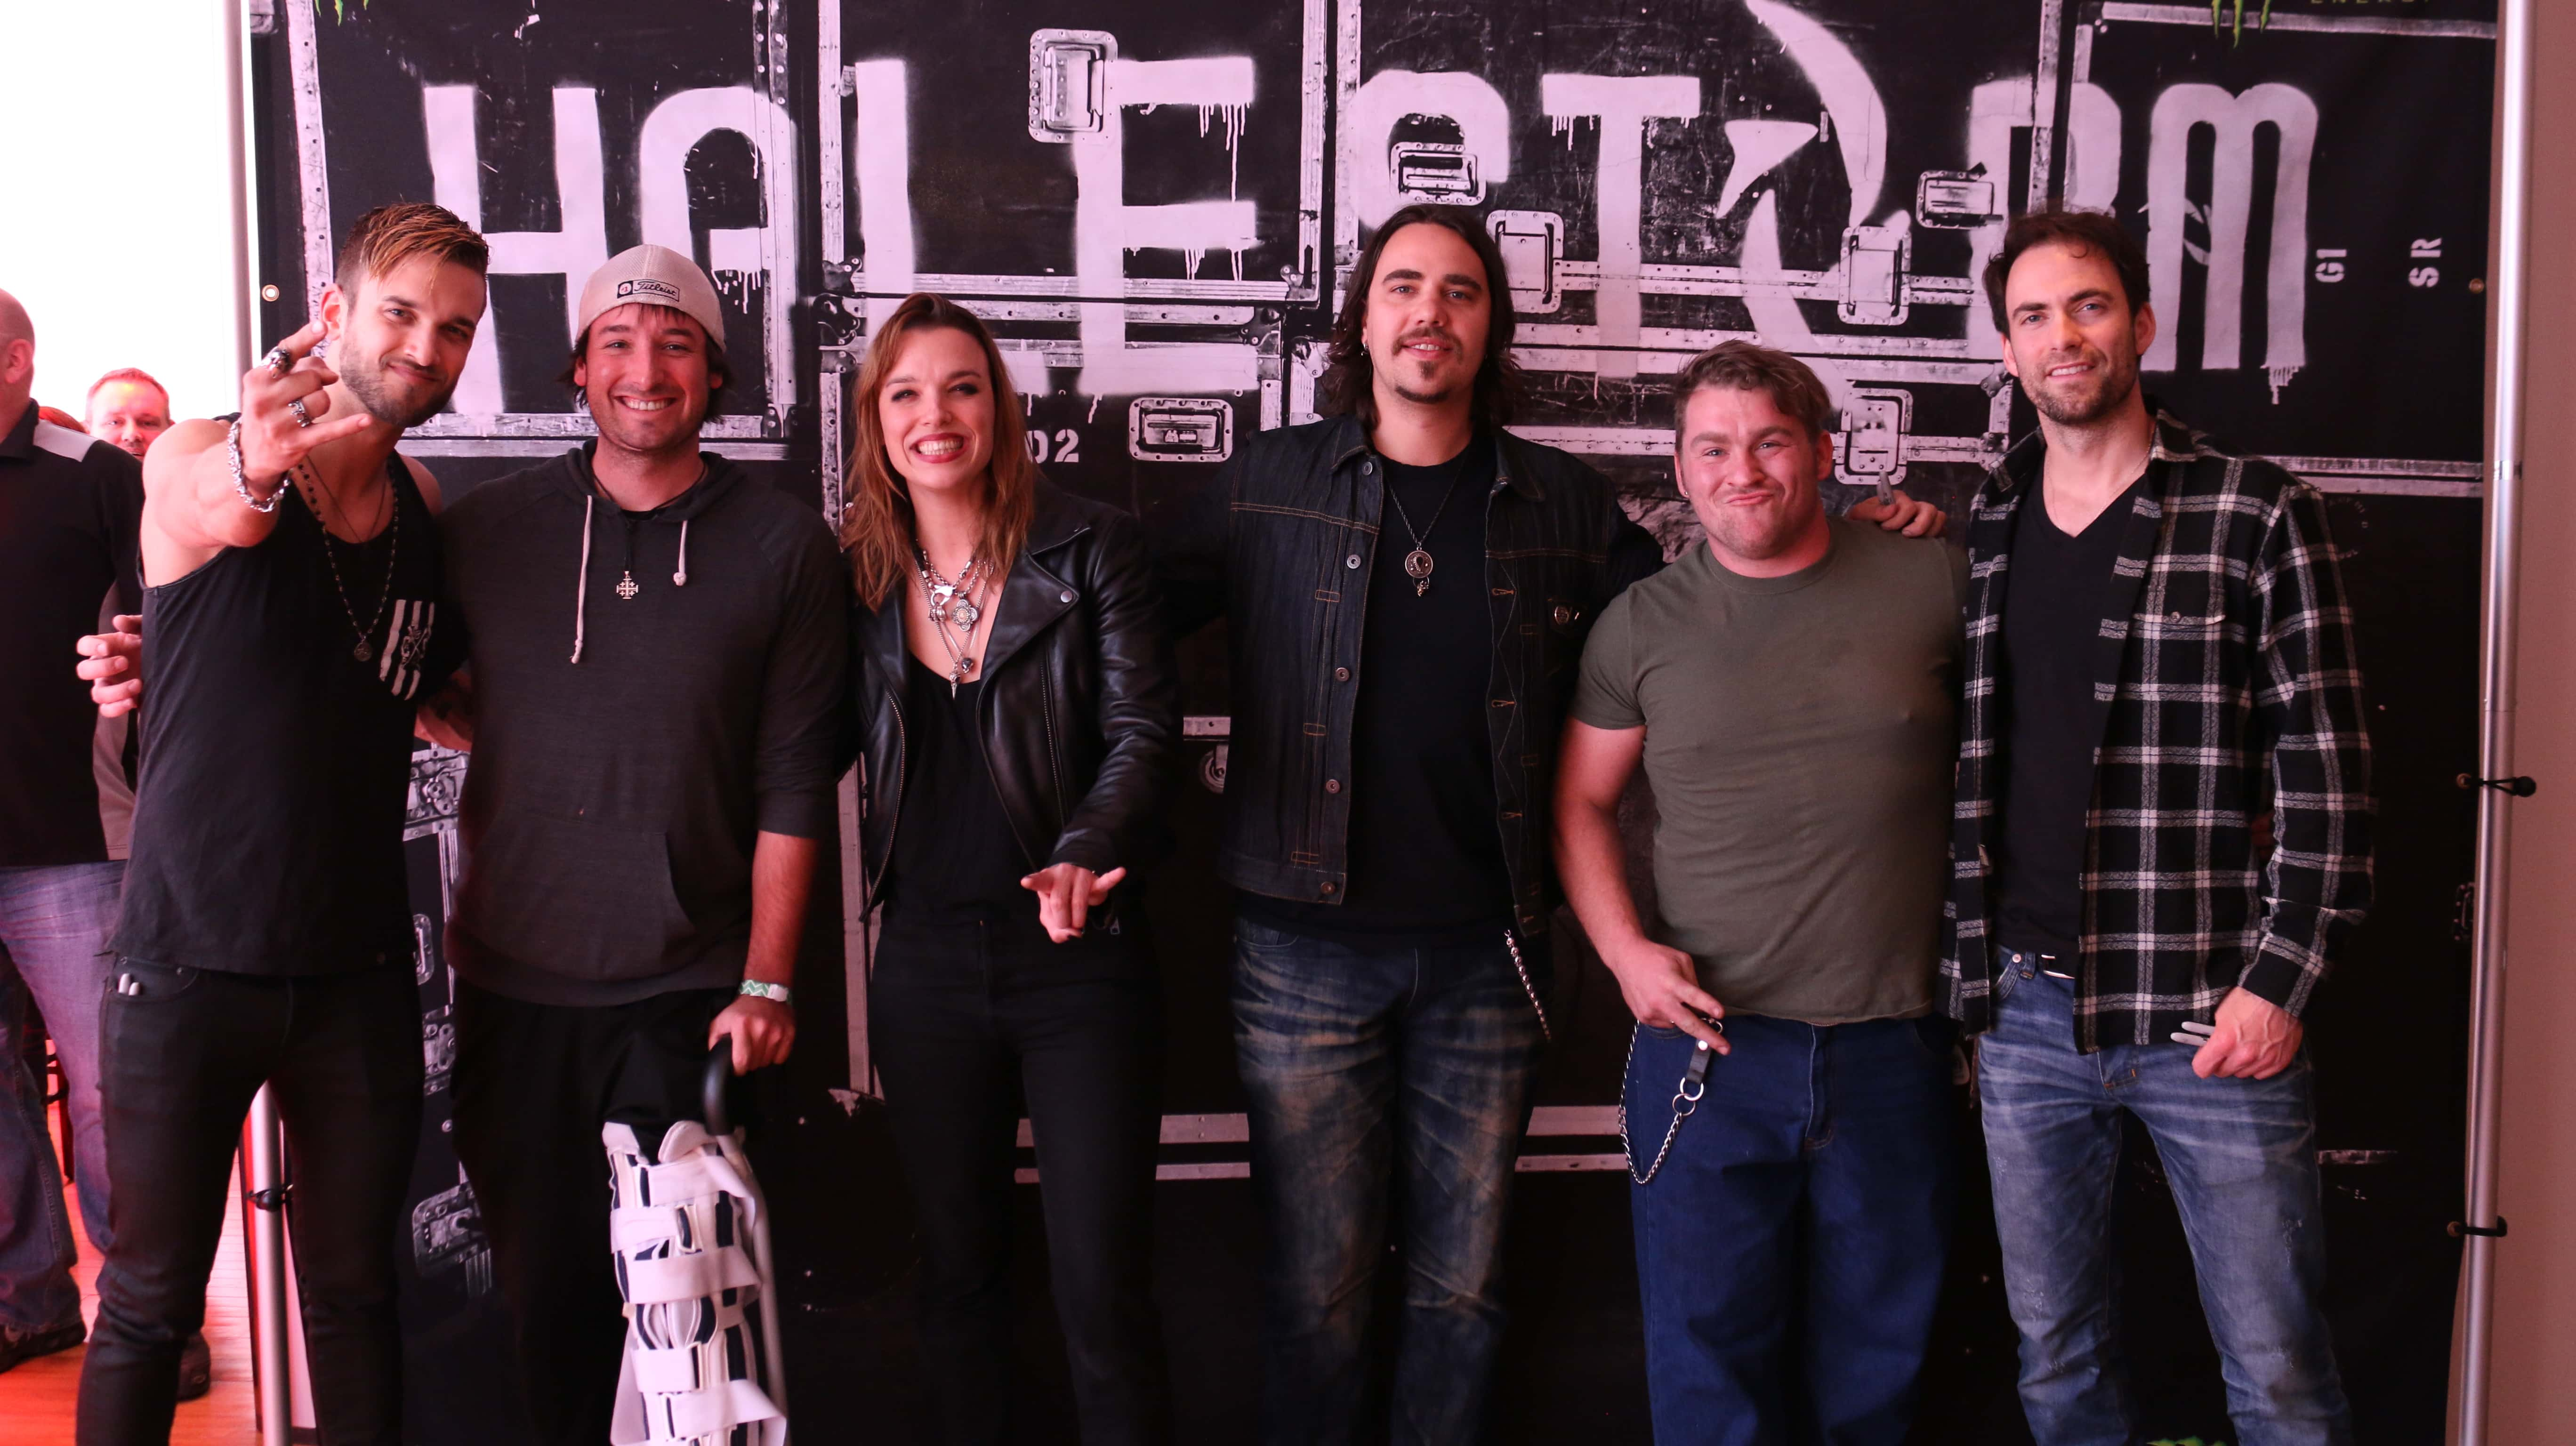 Halestorm Meet And Greet Q102 Springfields Rock Station